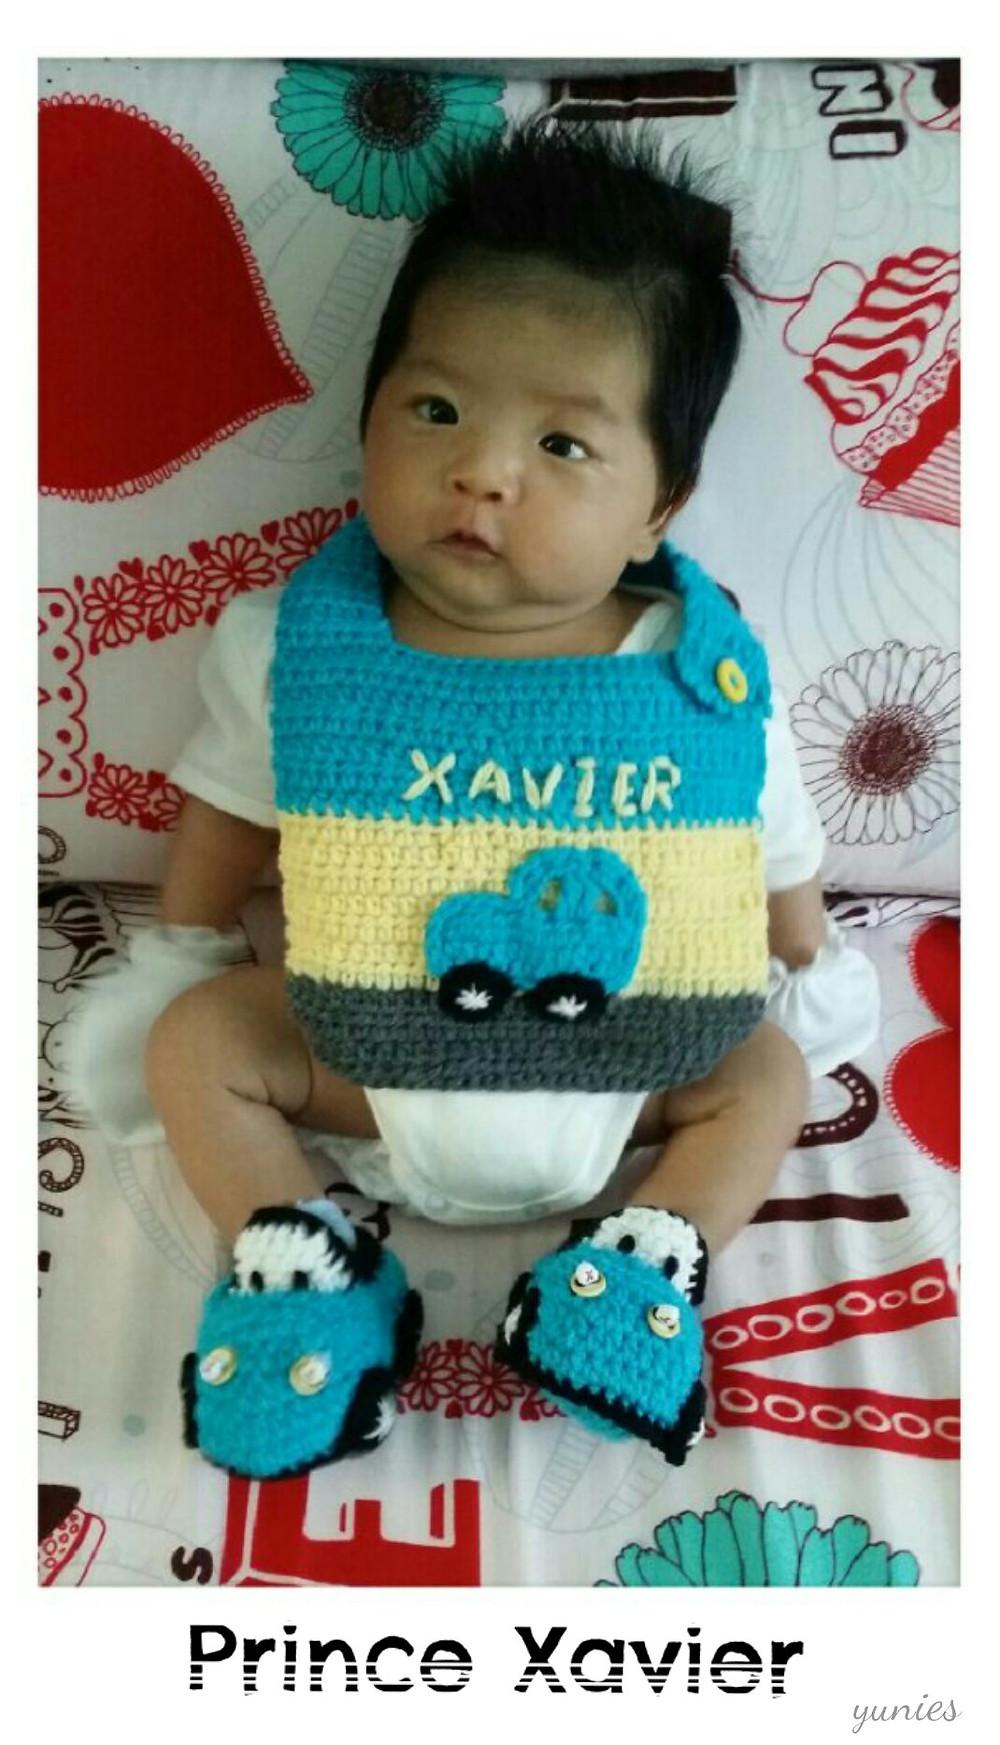 Prince Xavier Yunies Crochet car booties and bib